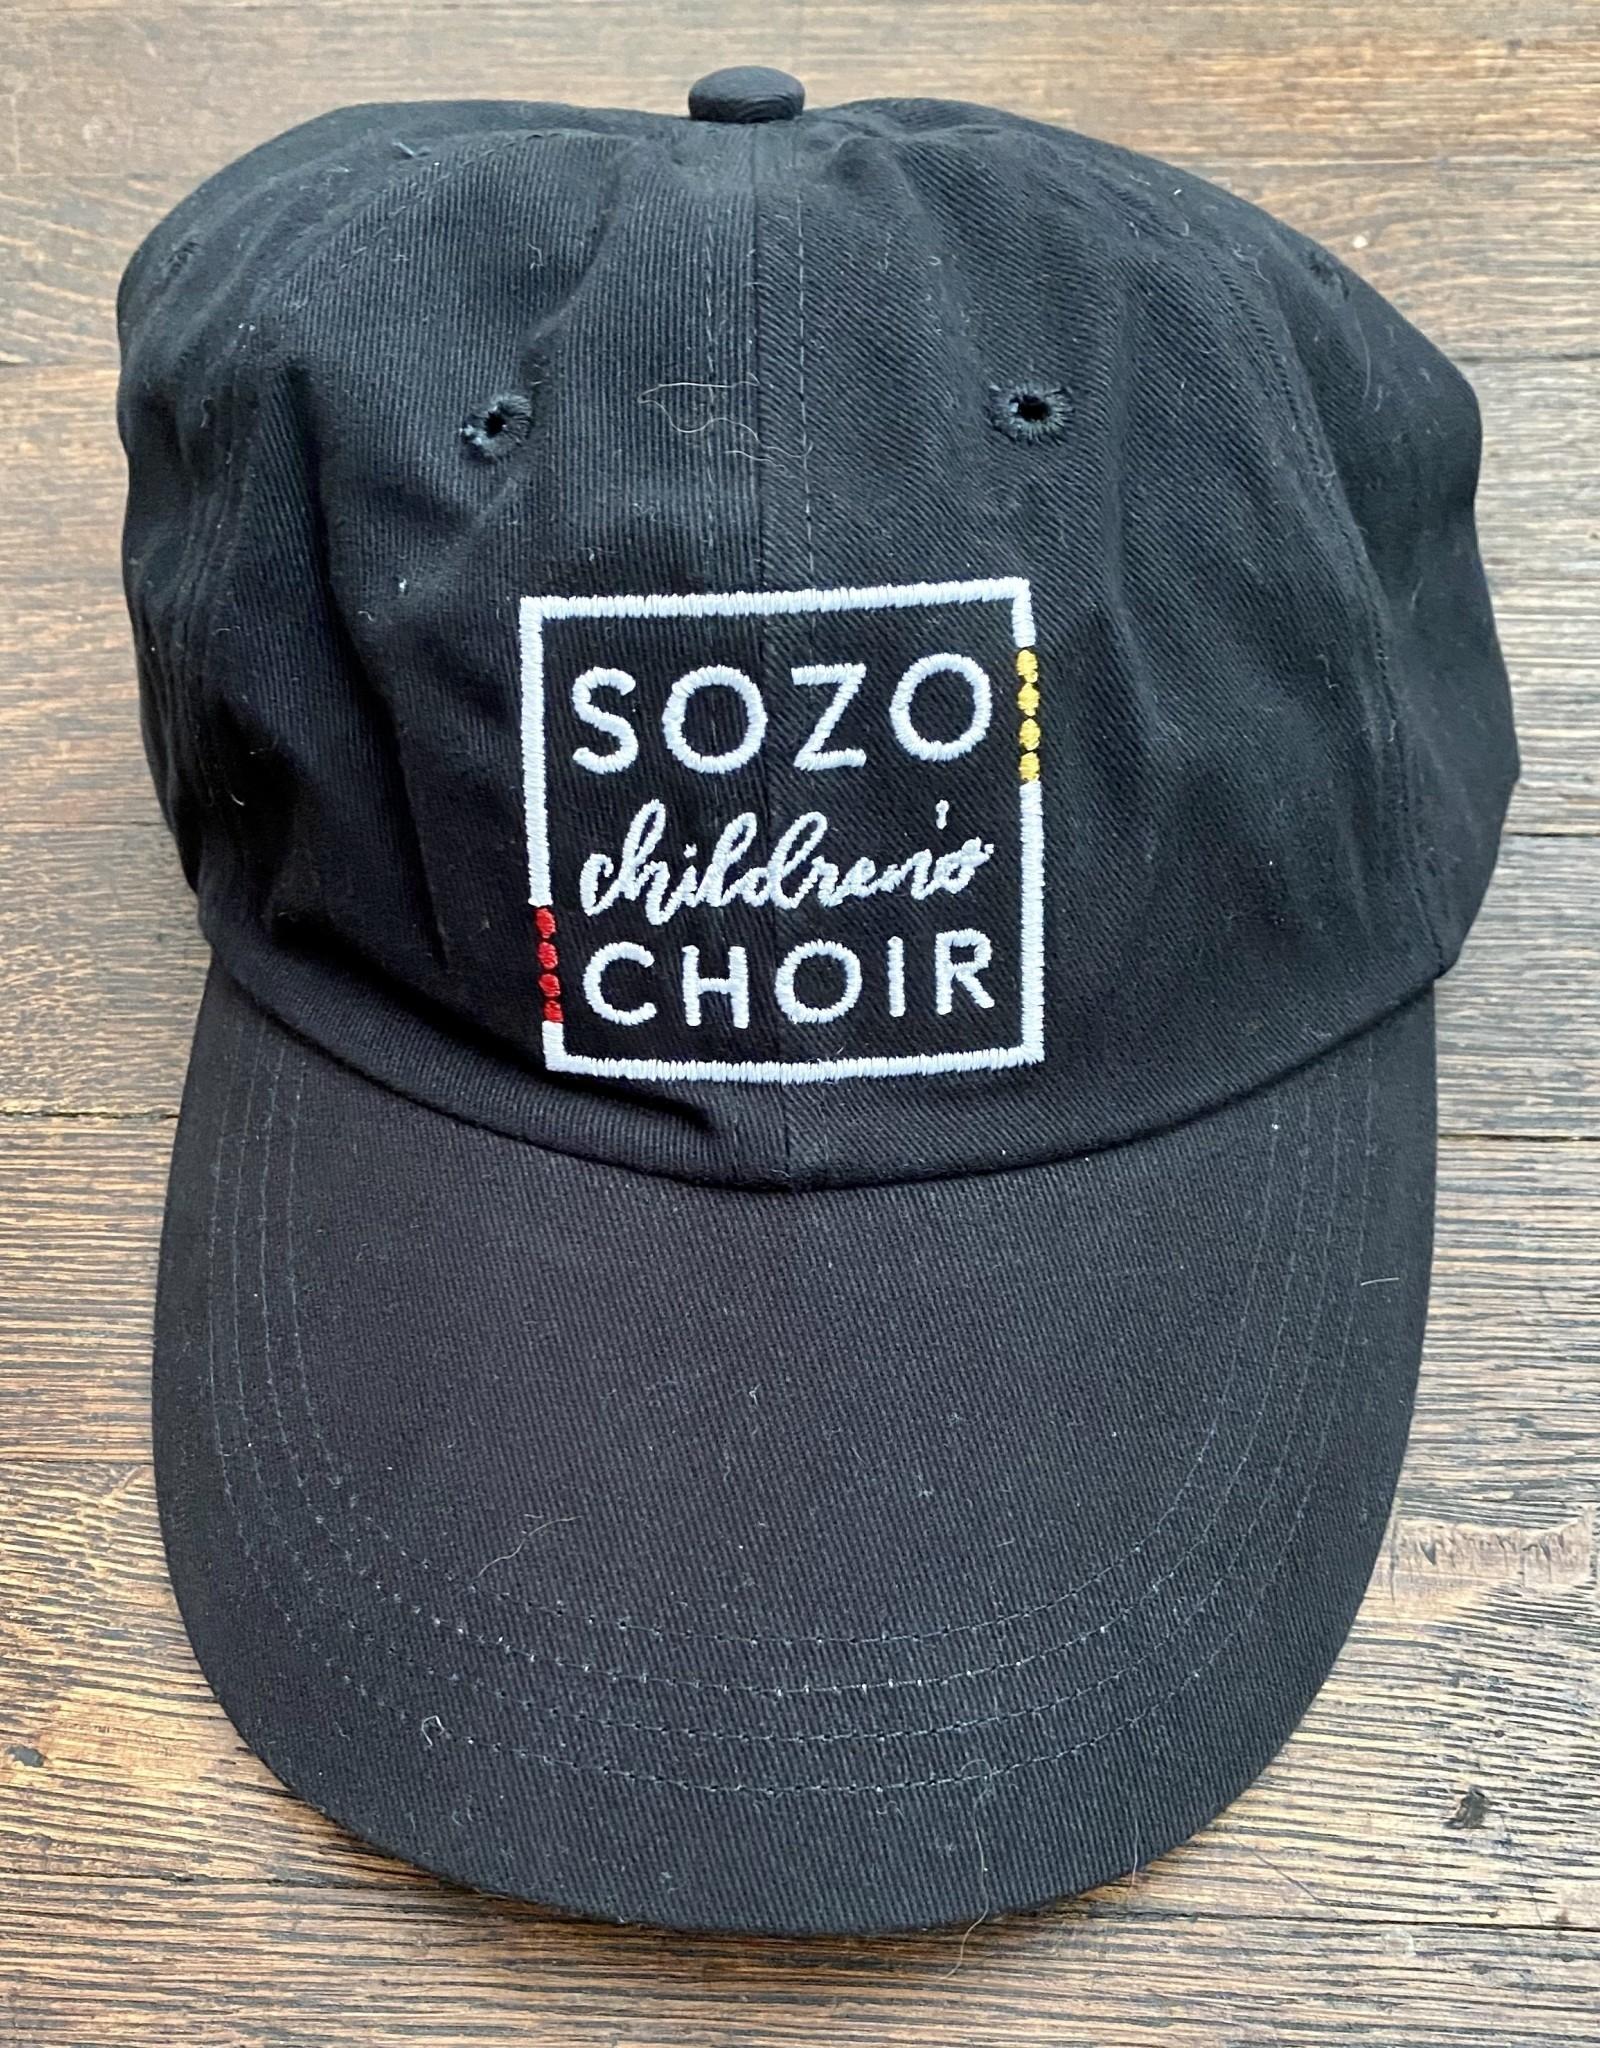 Sozo Choir Hat